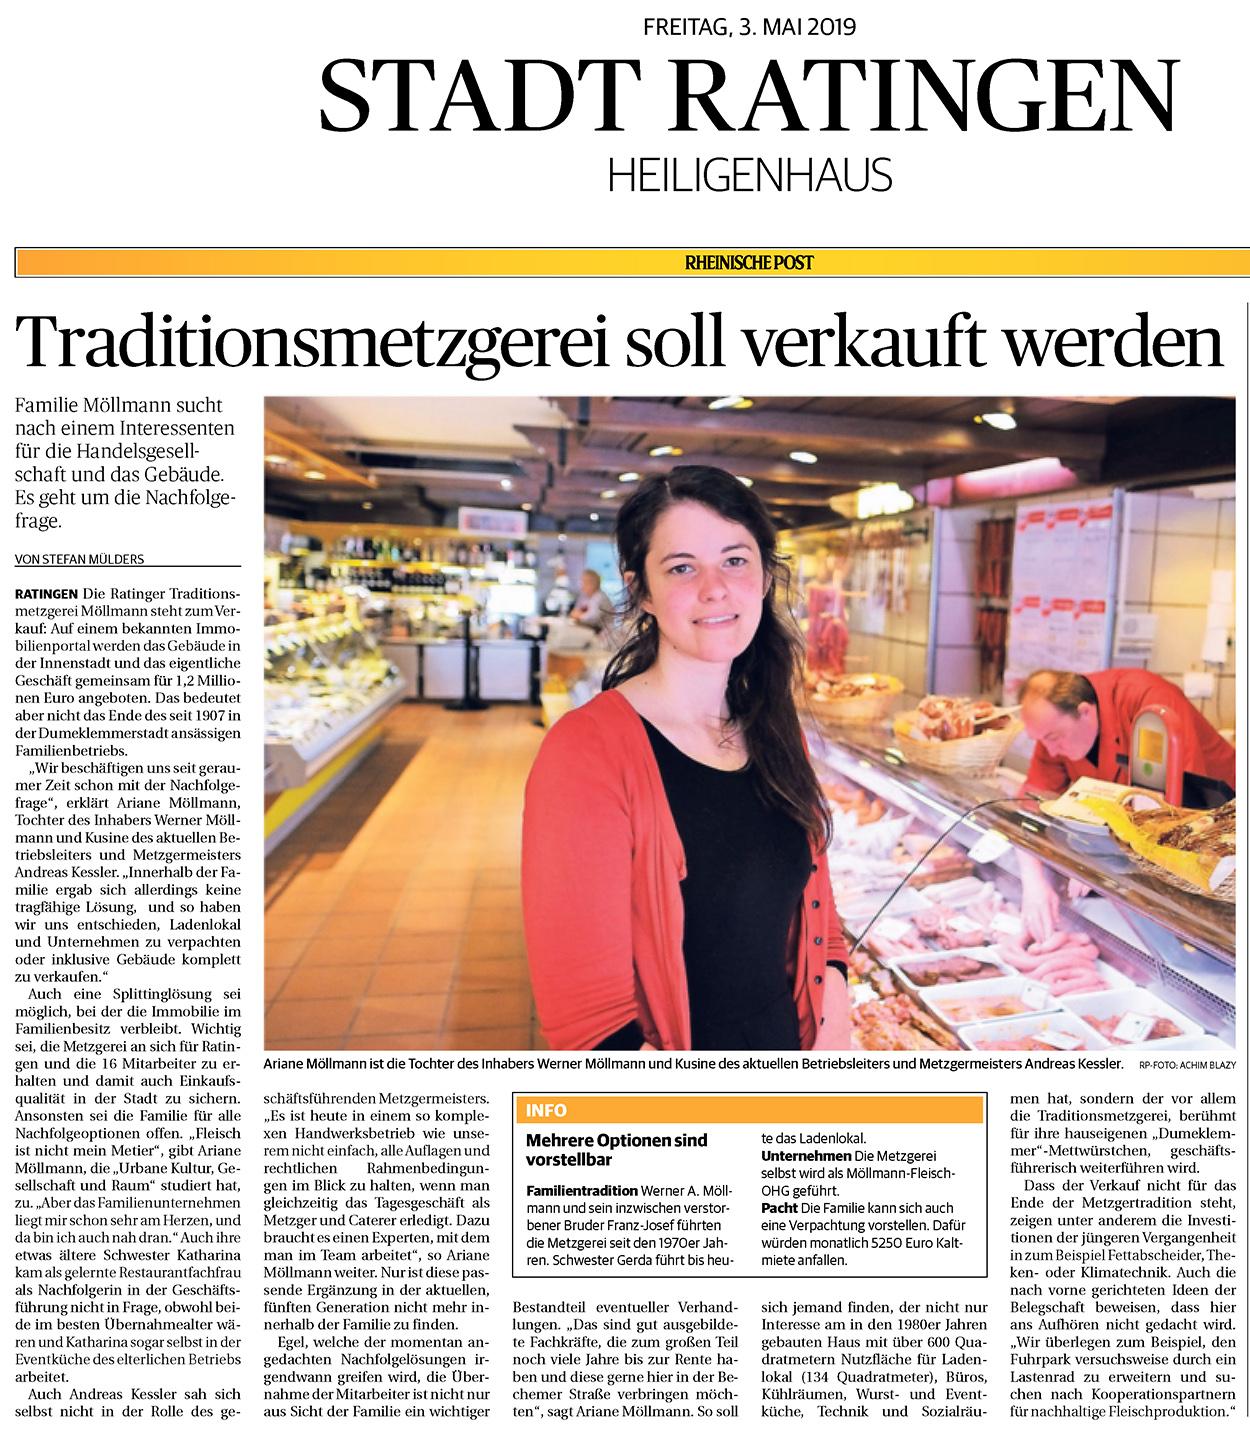 Traditionsmetzgerei wird verkauft - Stefan Mülders - Freier Journalist